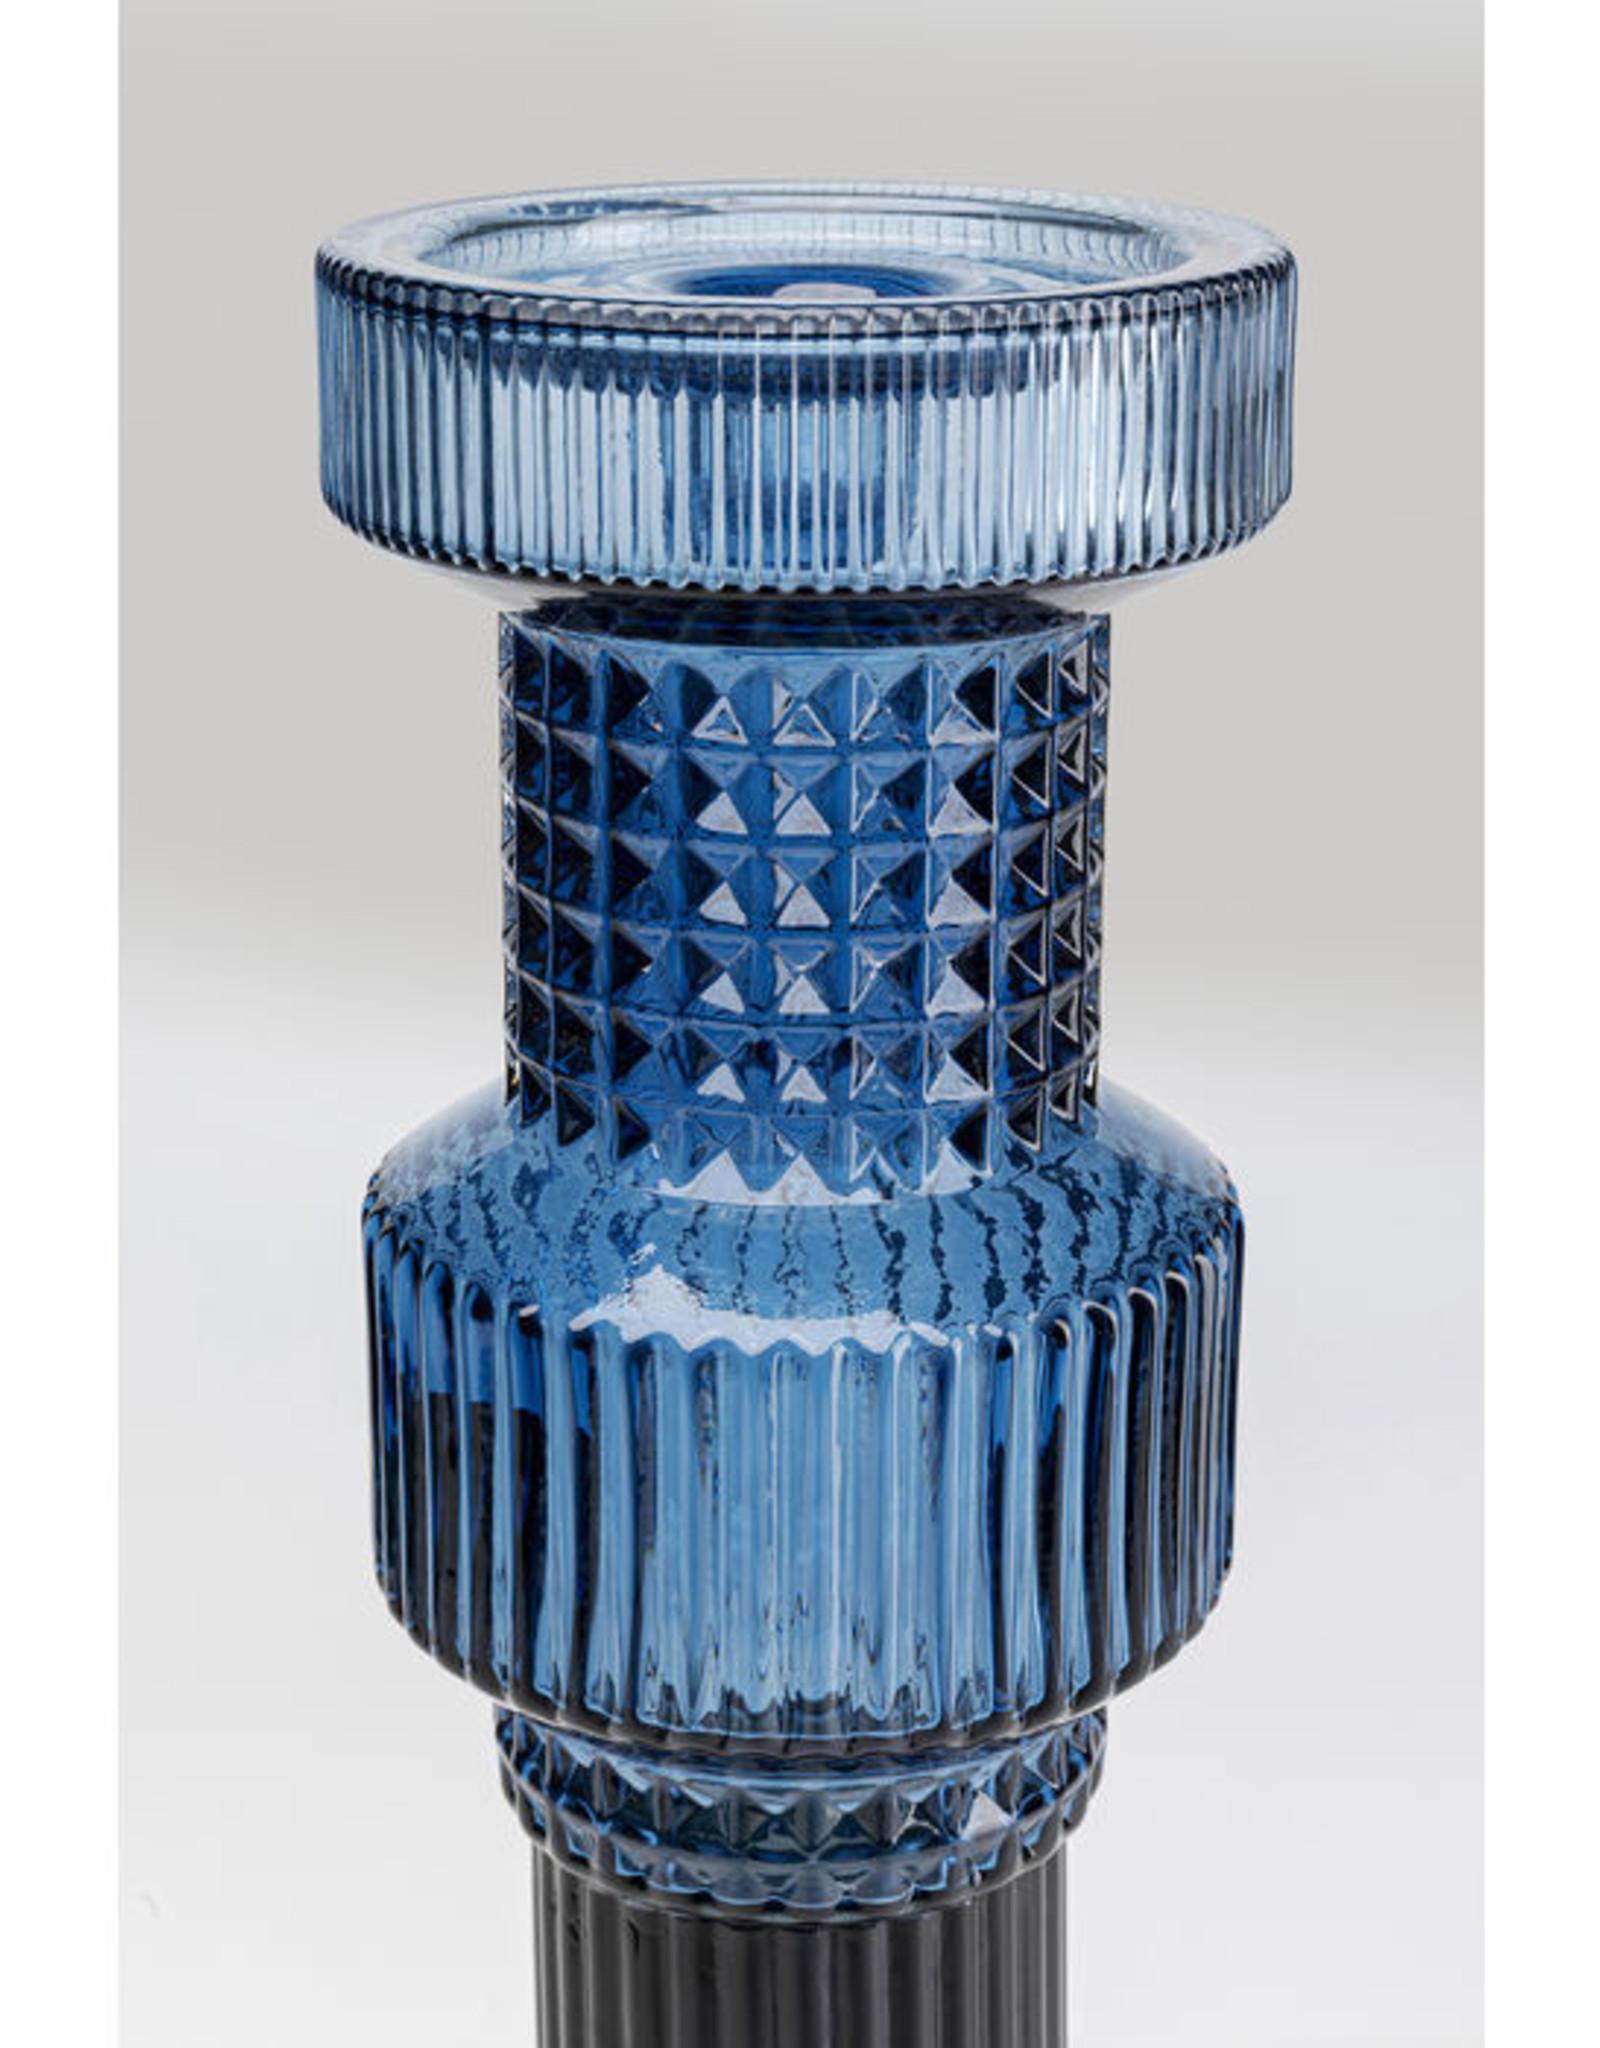 KARE DESIGN Candle Holder Marvelous Duo Blue Smoke